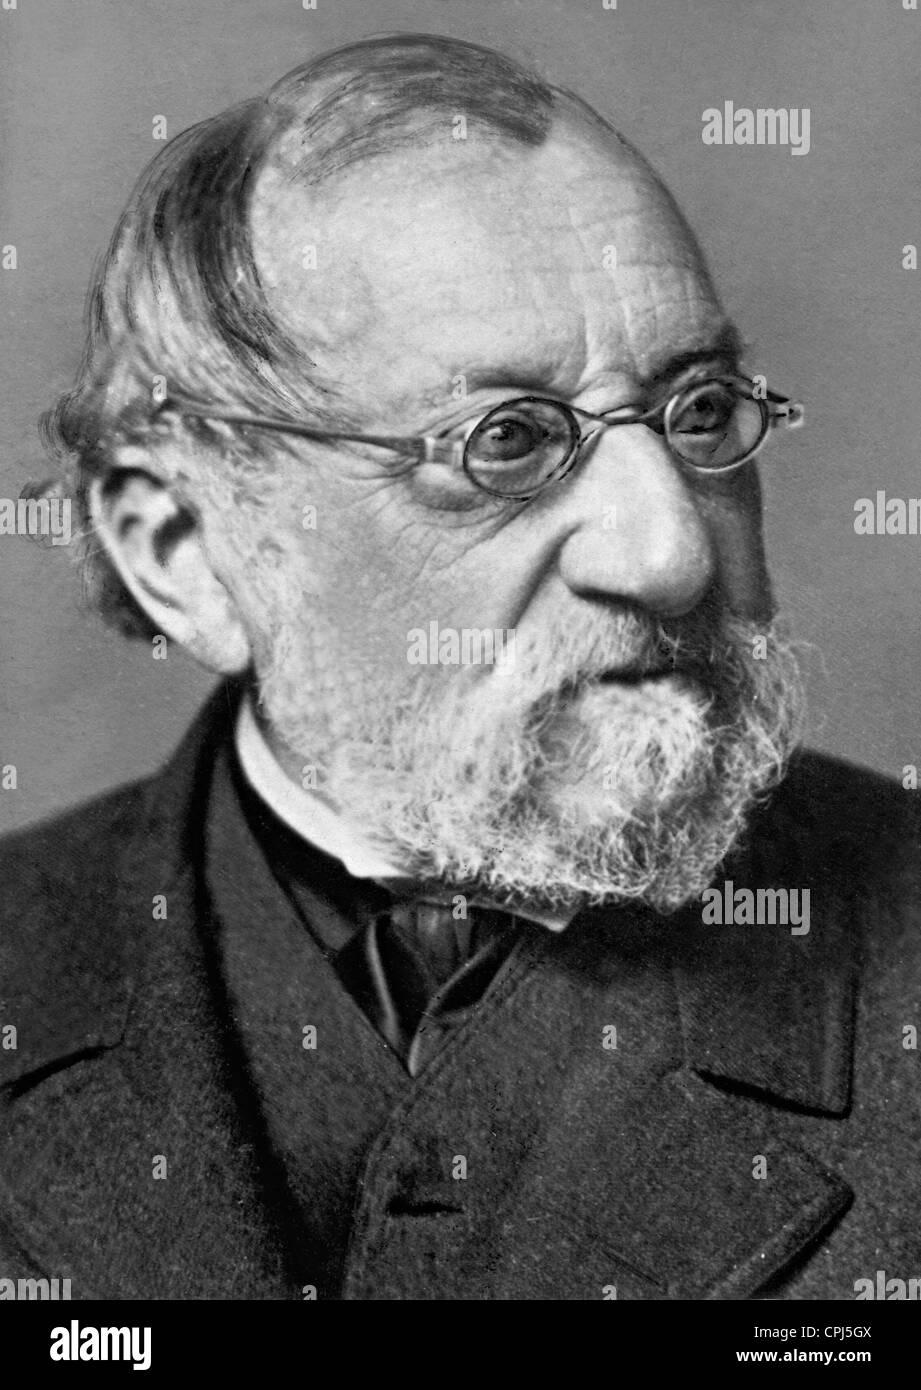 German painter Carl Spitzweg (1808-1885). - Stock Image